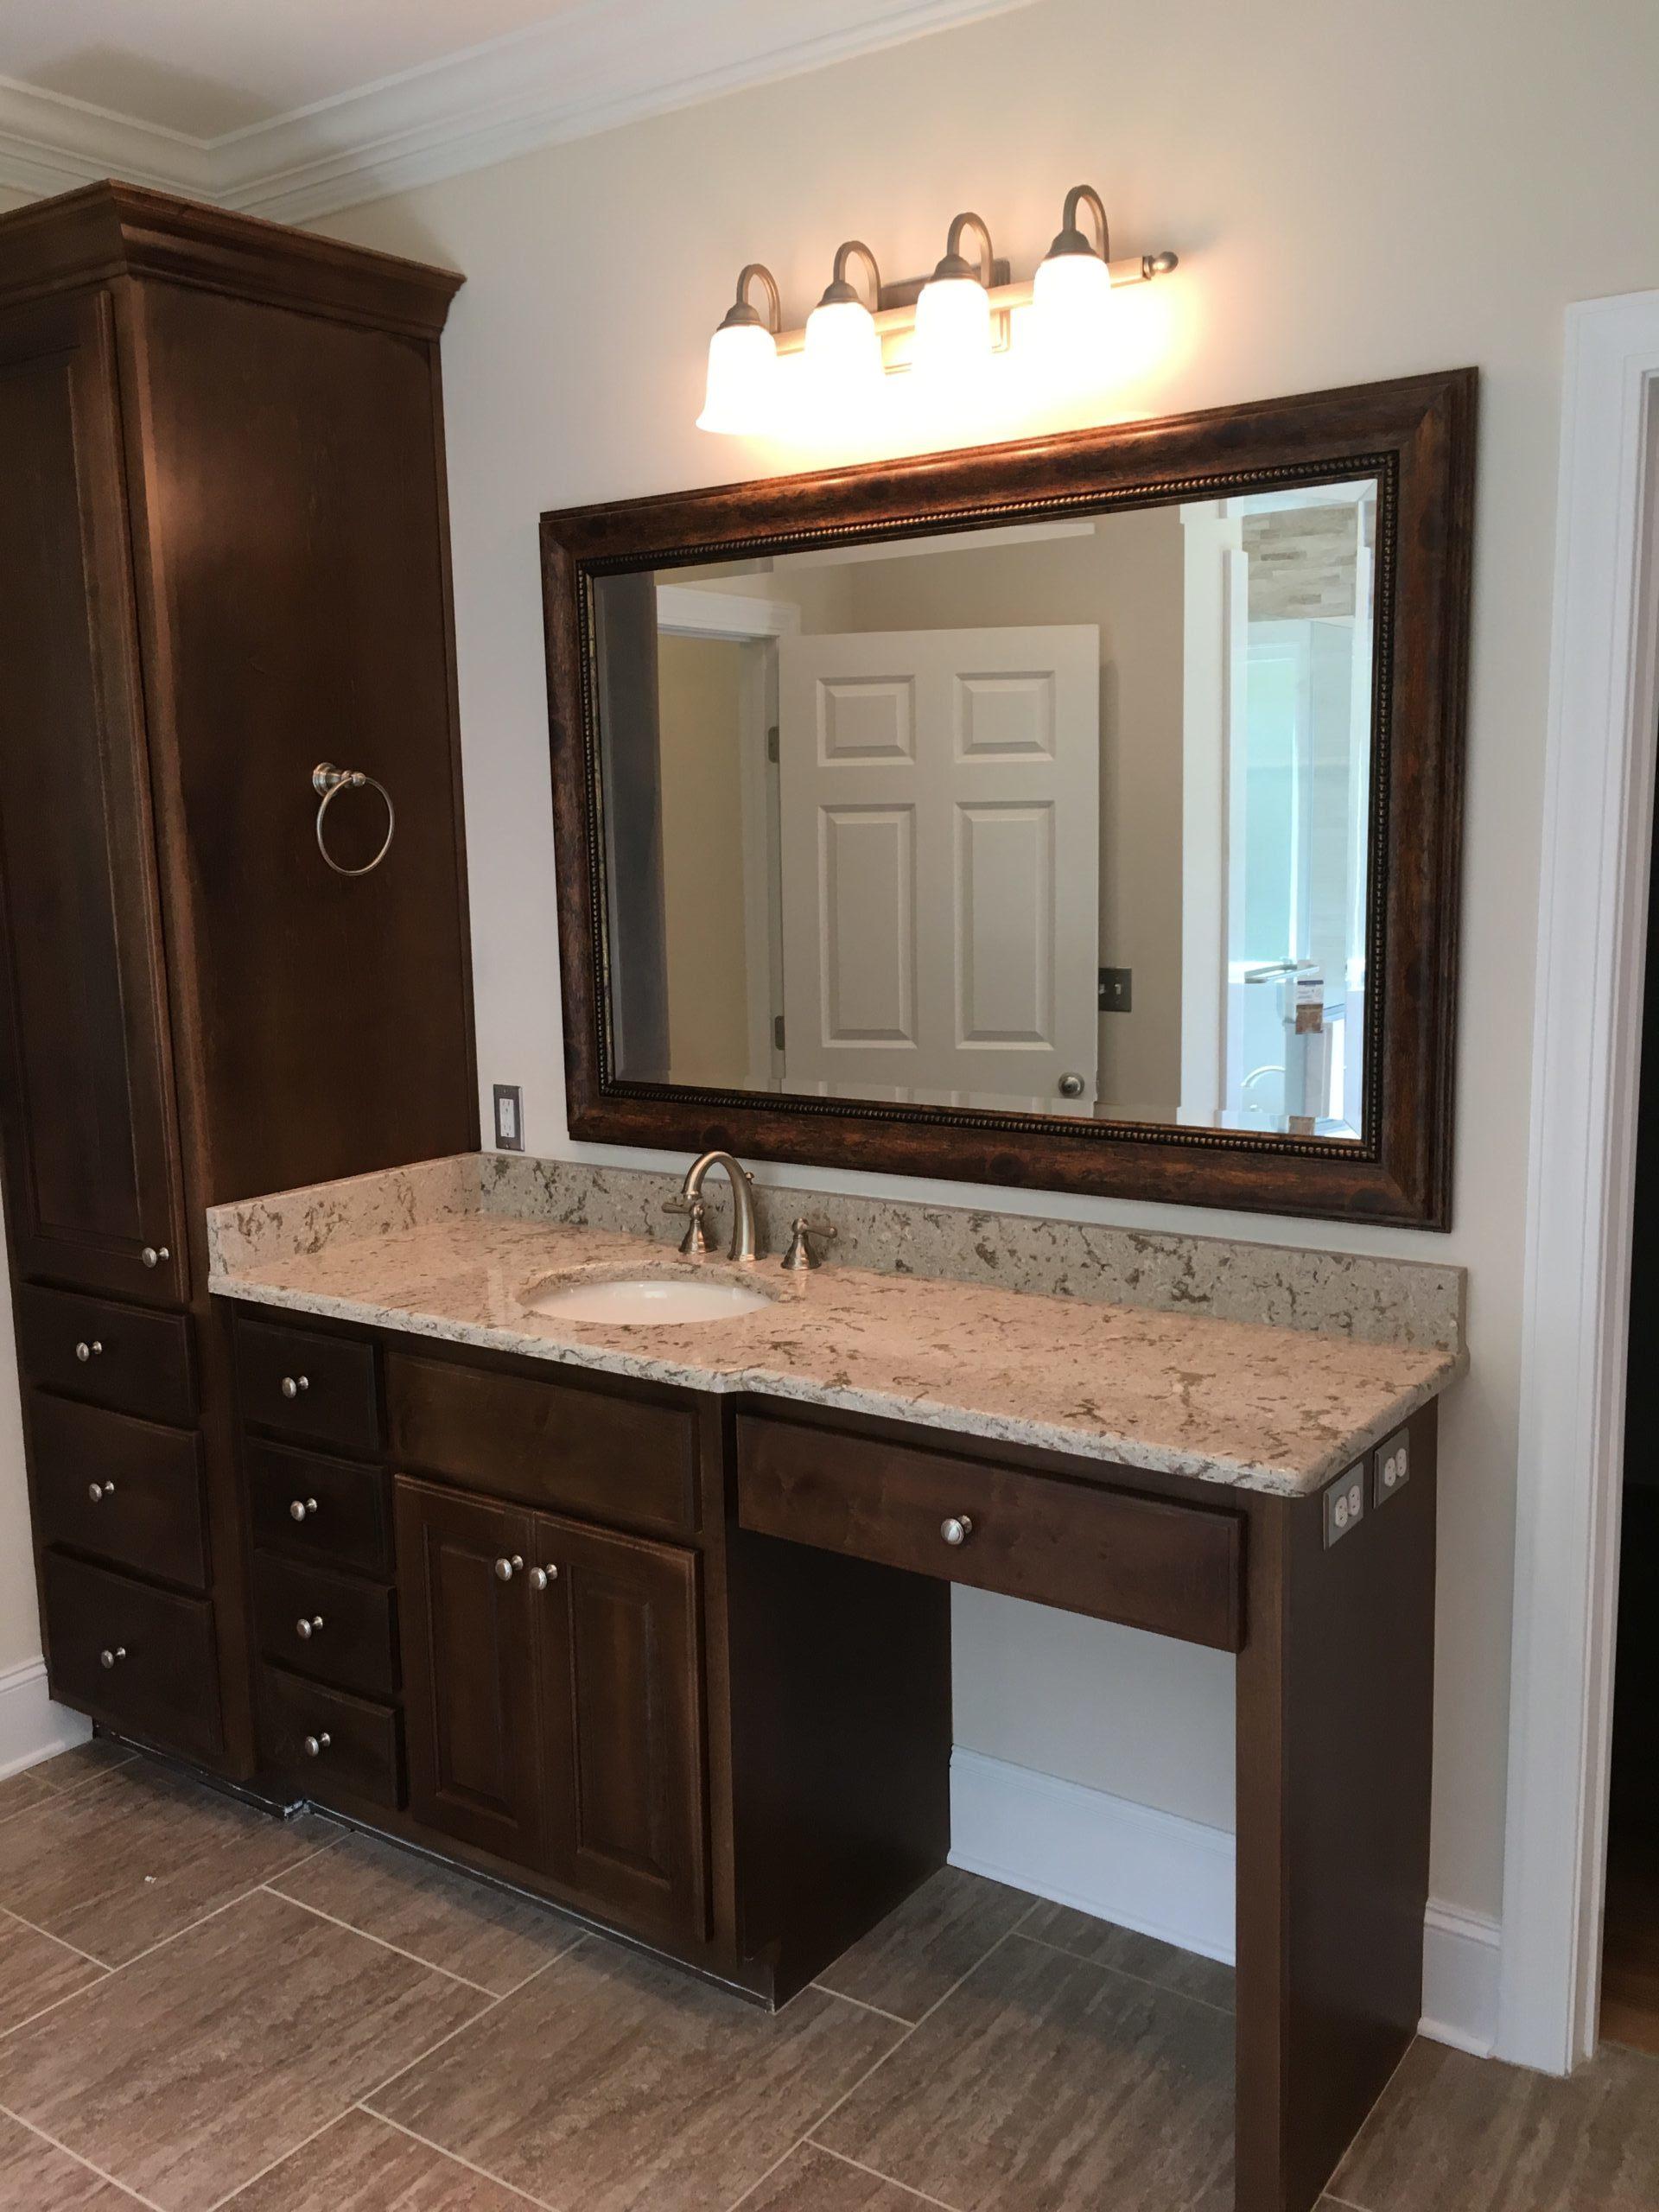 bathroom-remodeling-work-TAG-Builders-628-BW-Bathroom-ba-3-scaled-e1586519299964